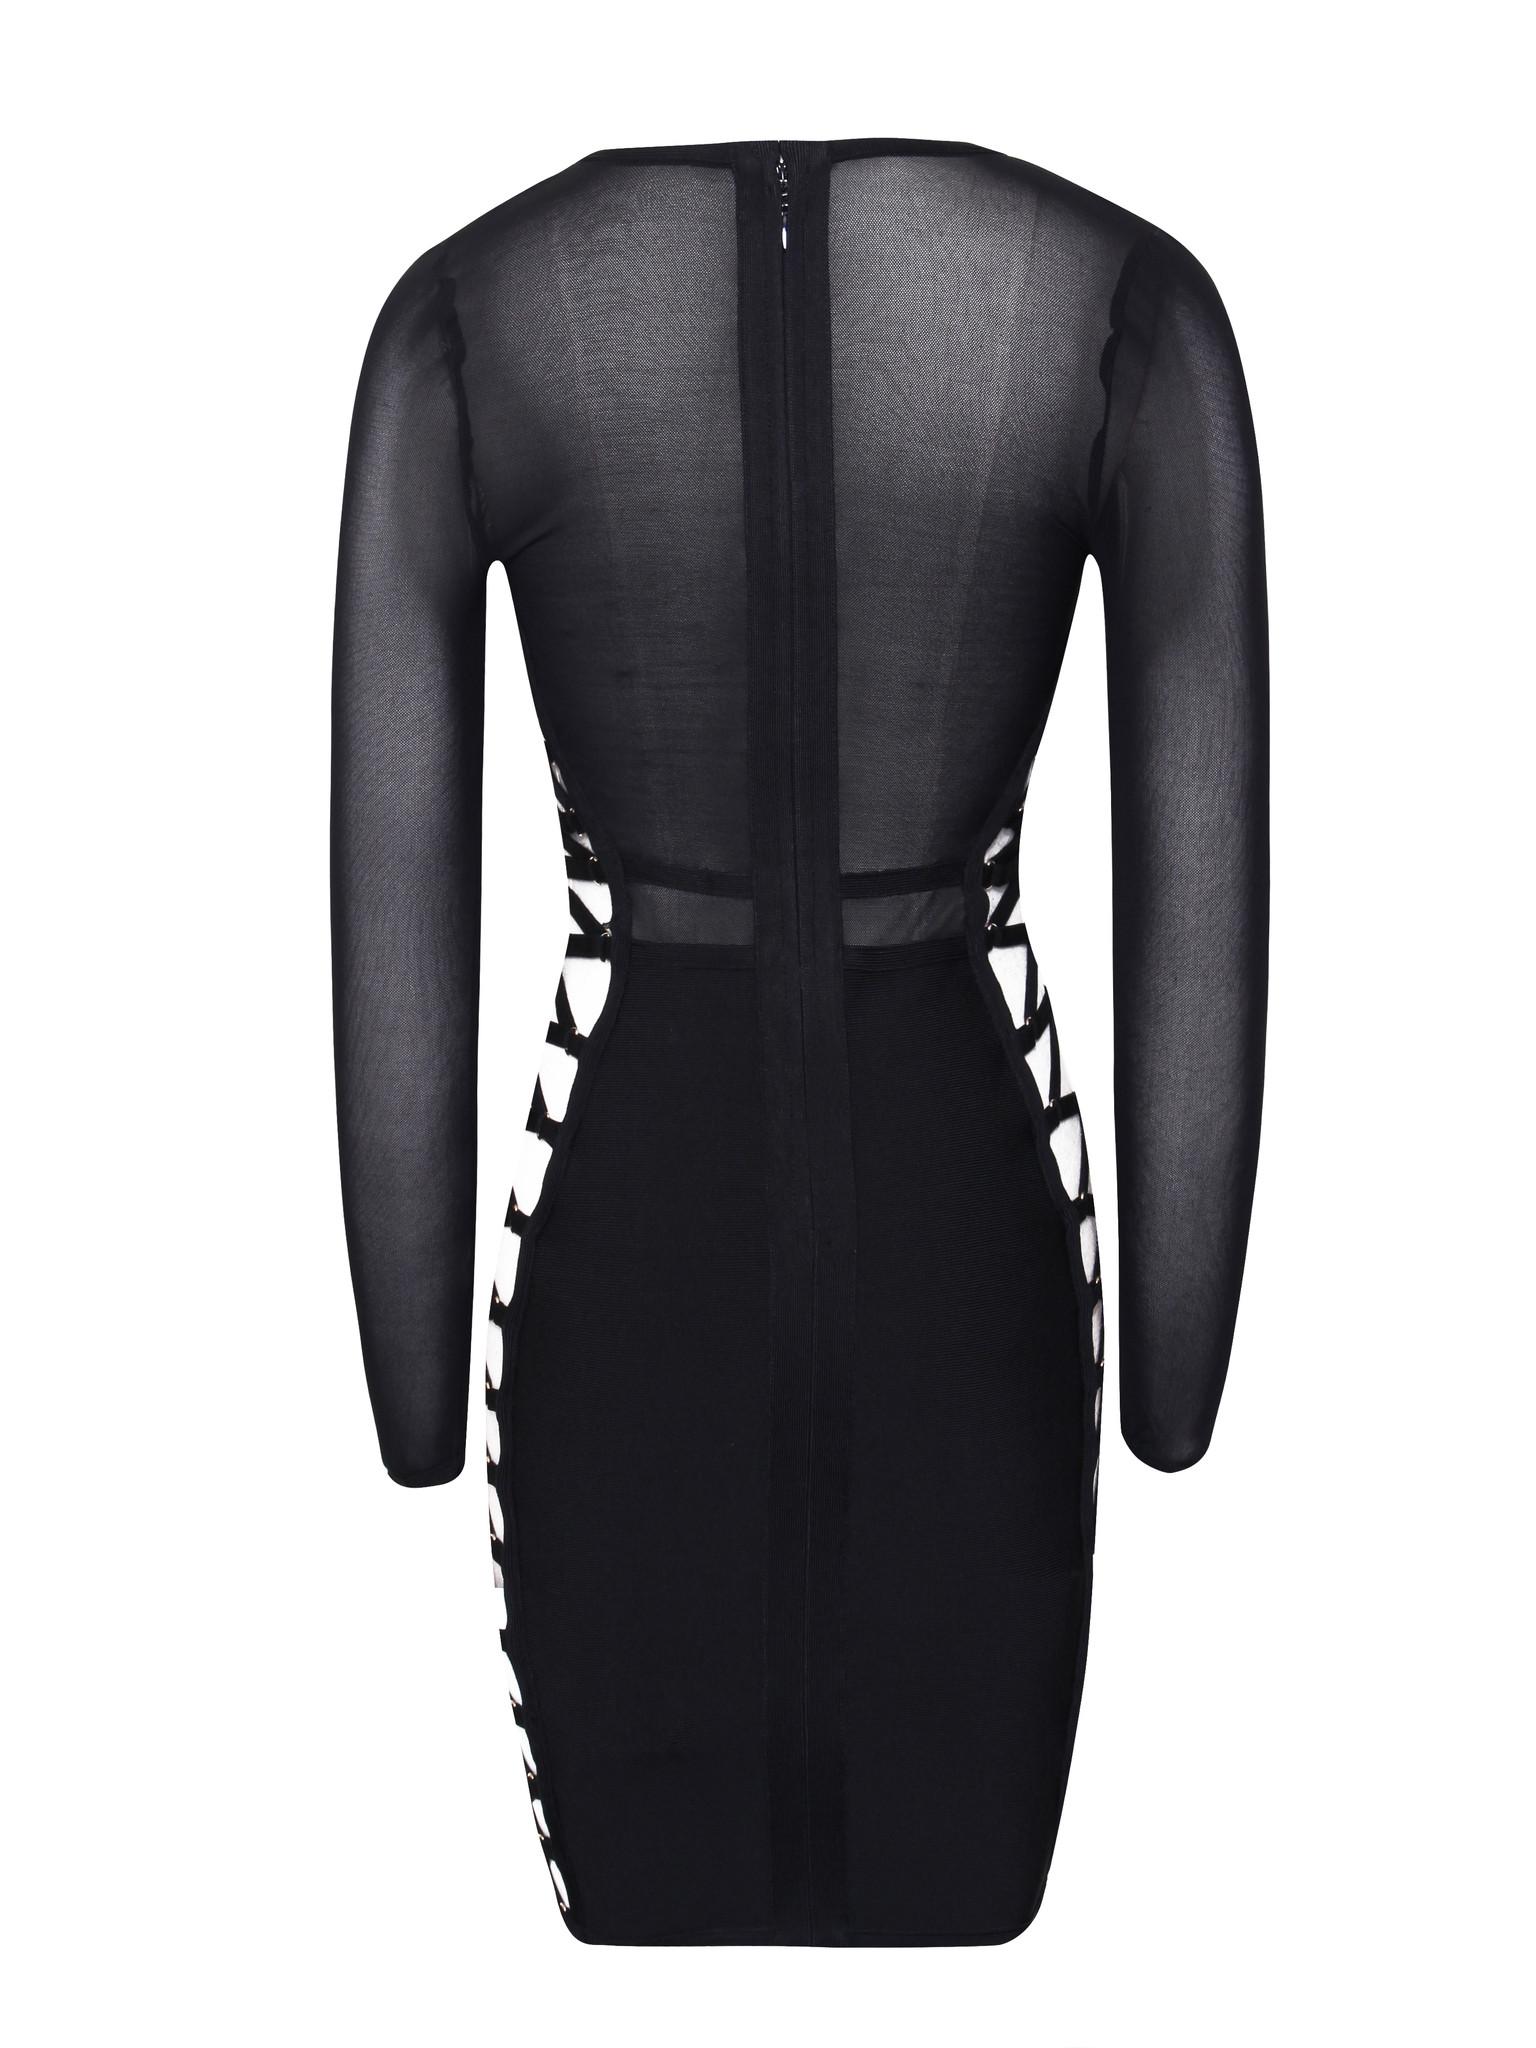 4c59a7721eca6 ... Devon Windsor Cutout Tie Up Detail Mesh Long Sleeve Bandage Dress -  Thumbnail 2 ...